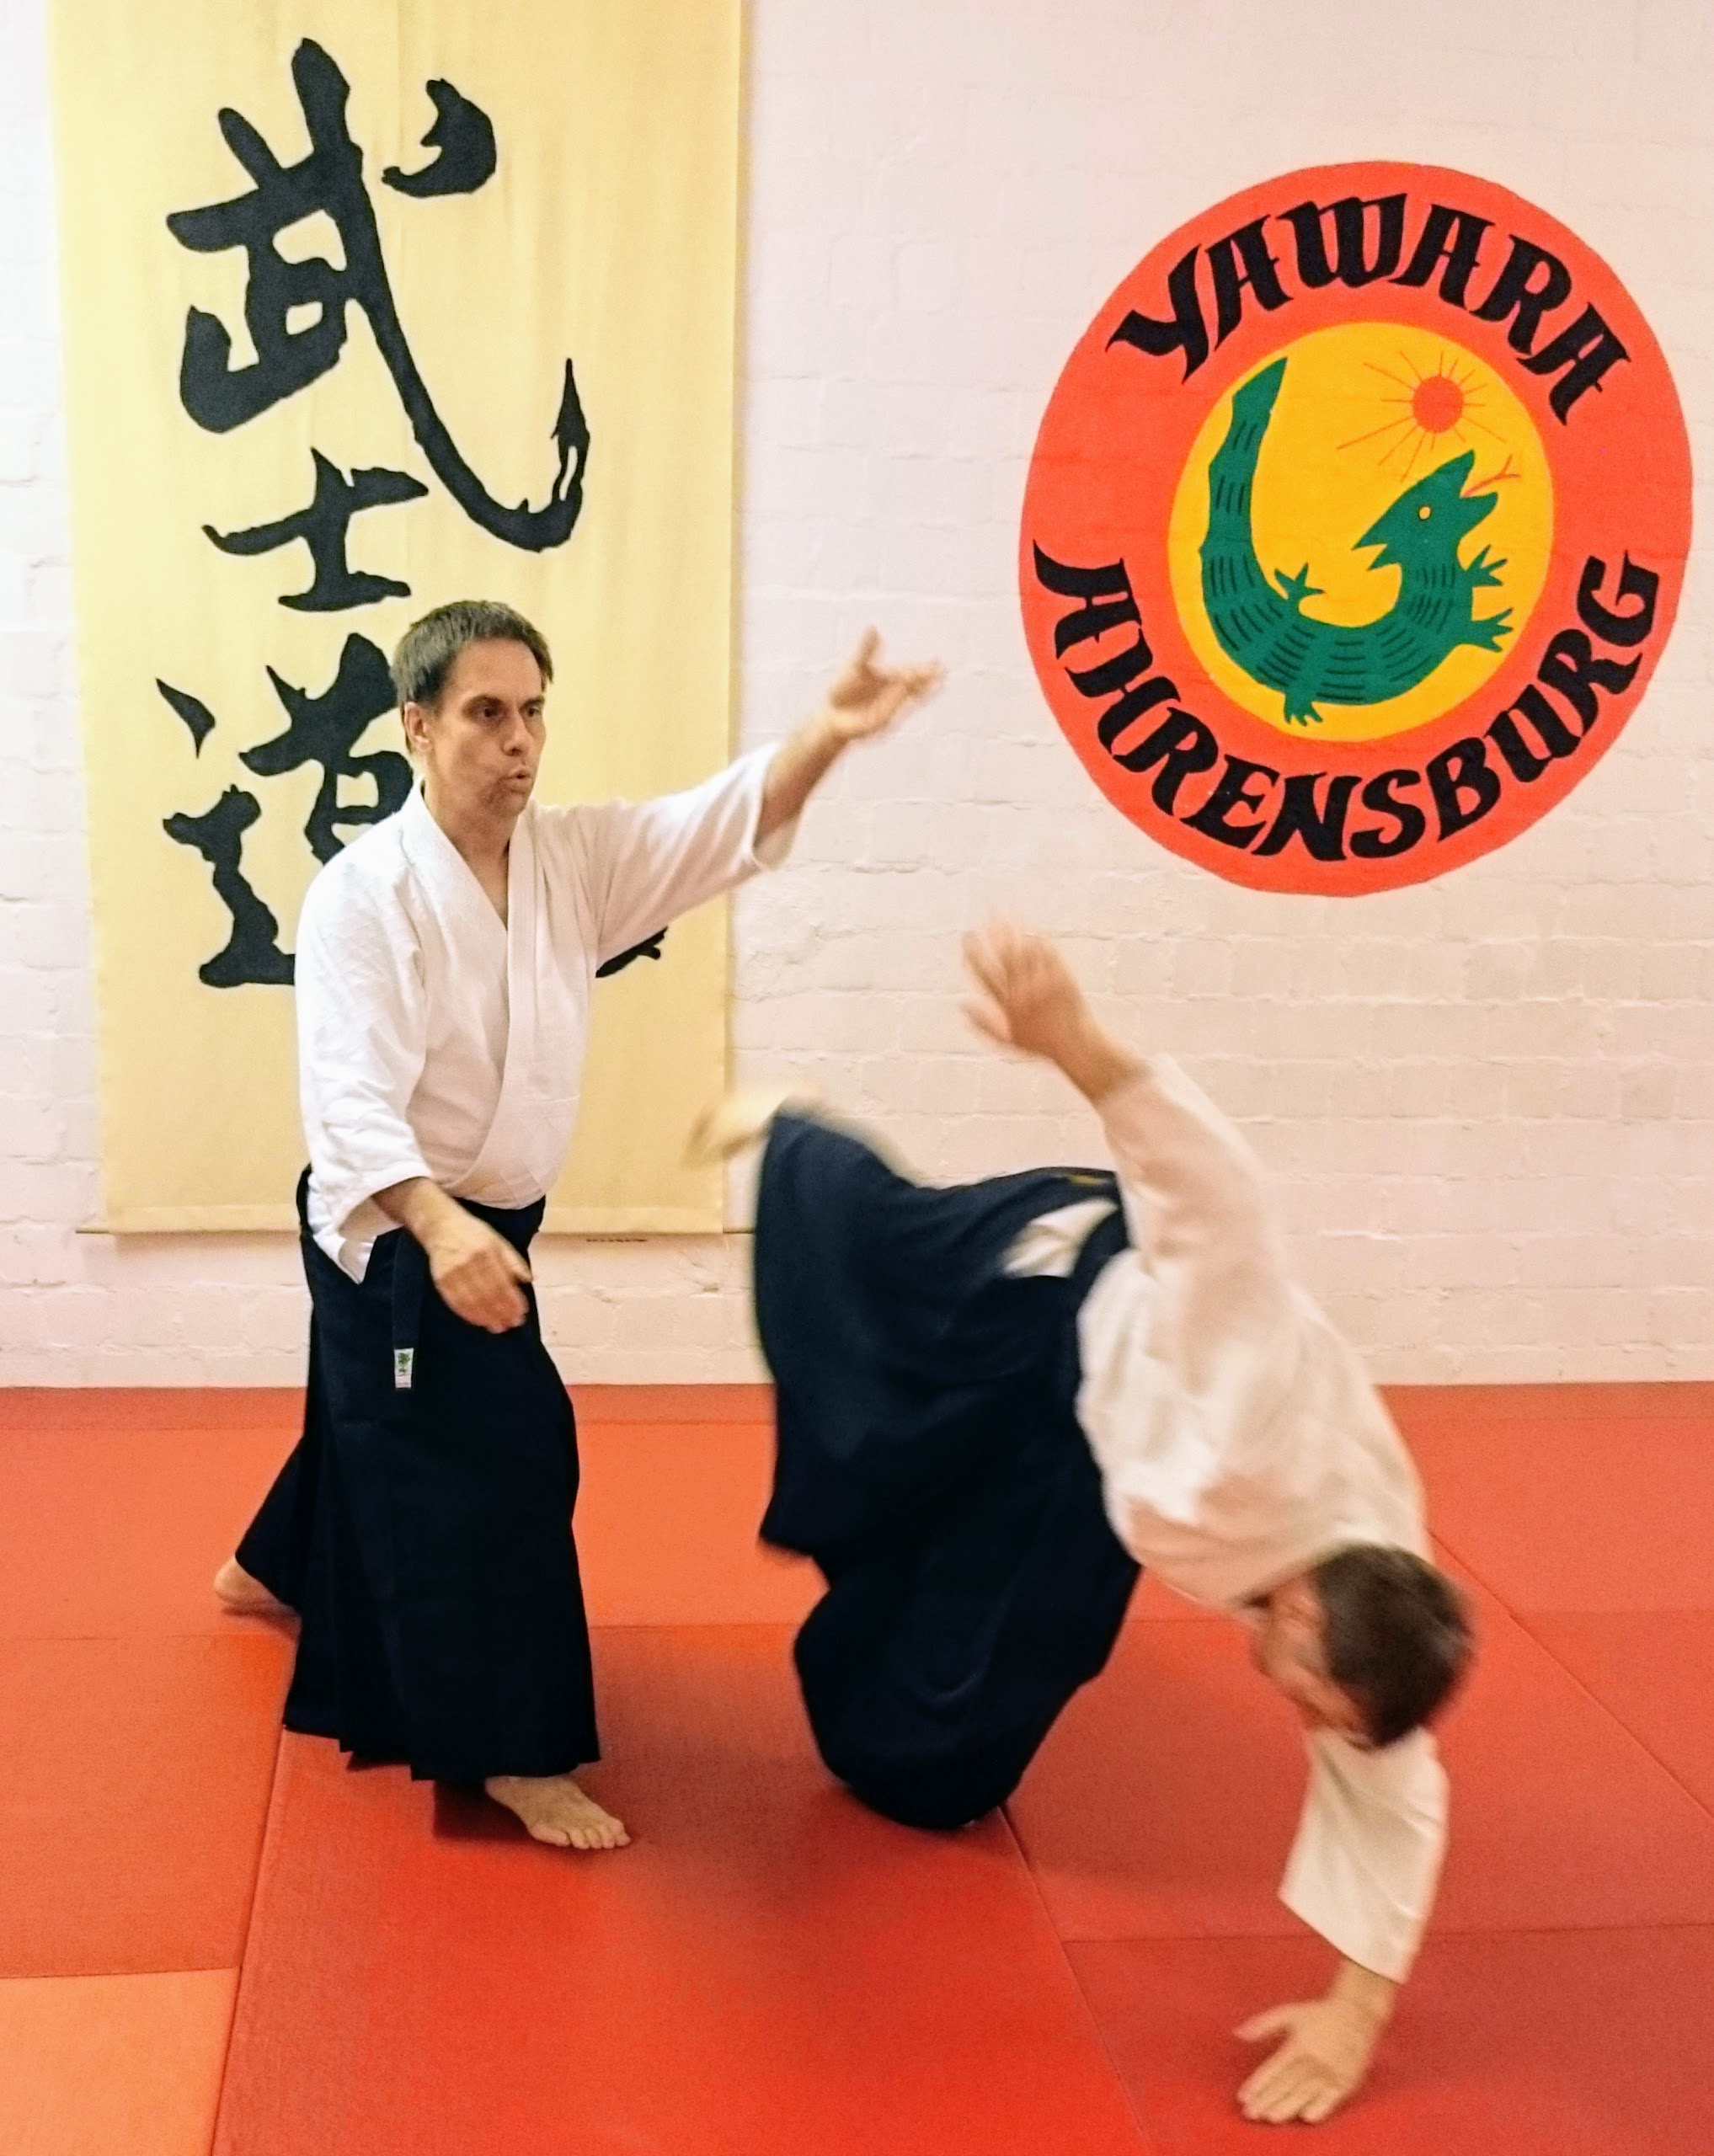 Aikido bei Yawara Ahrensburg